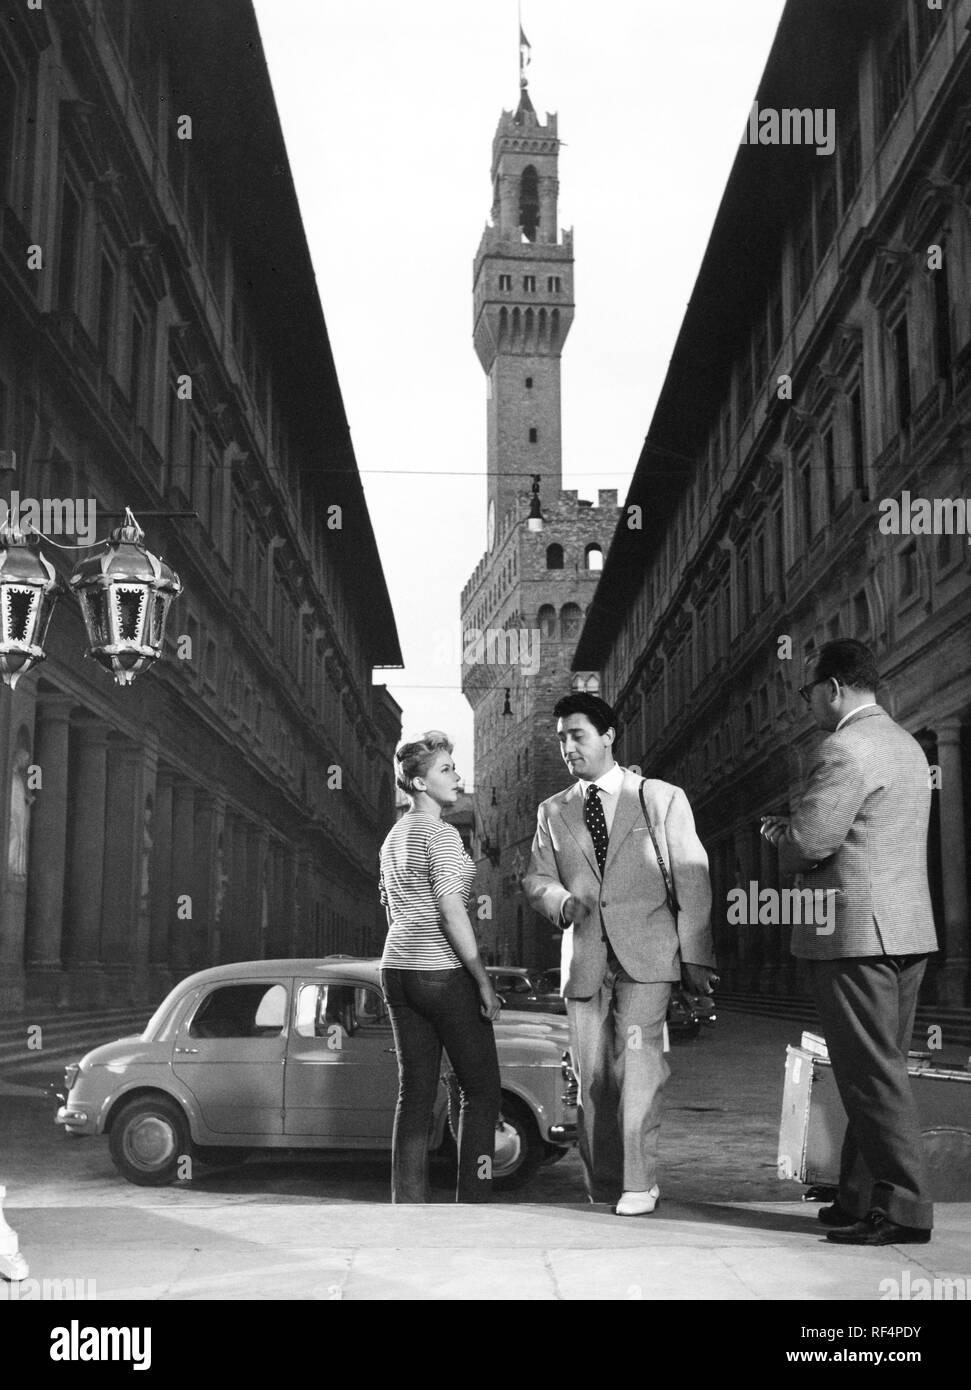 alberto sordi and isabelle corey, souvenir d'italie, 1956 - Stock Image